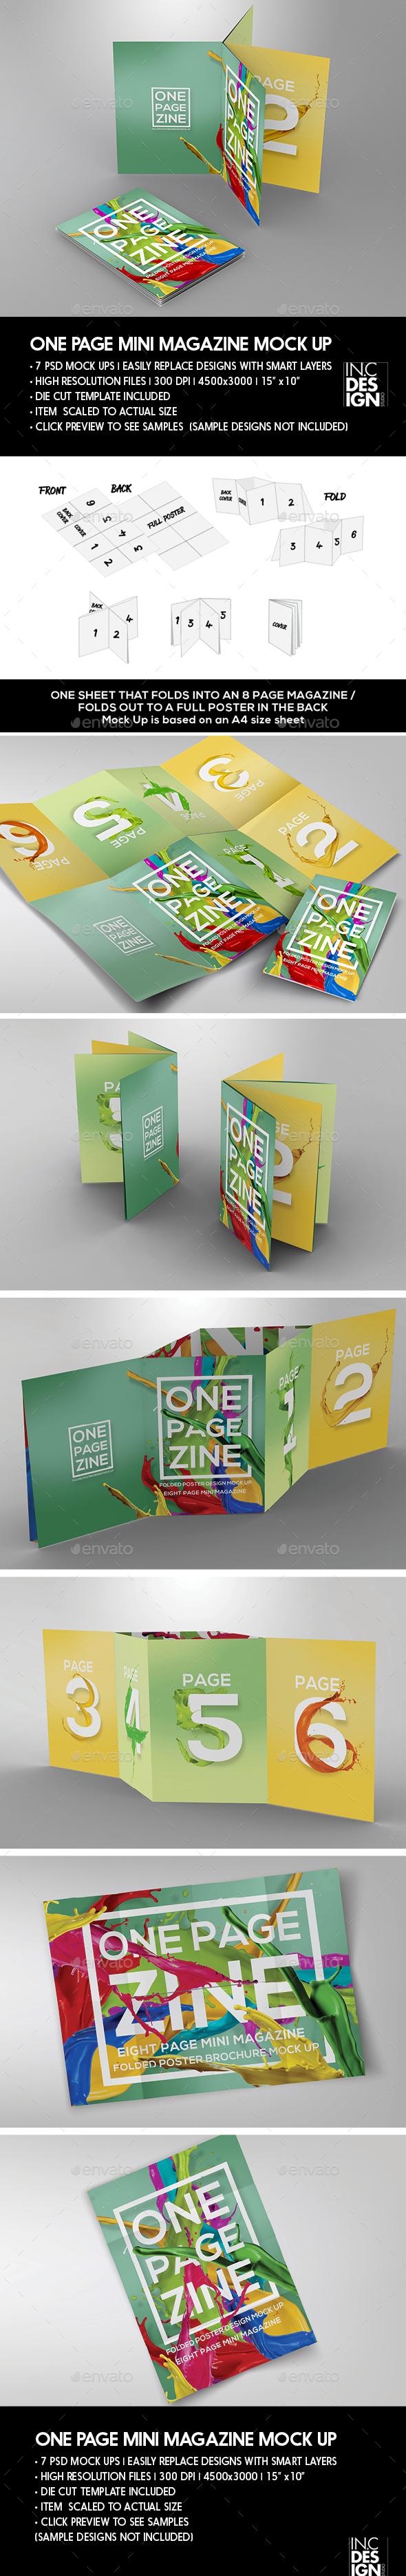 One Page Mini MagaZine | Foldout Poster Booklet - Magazines Print